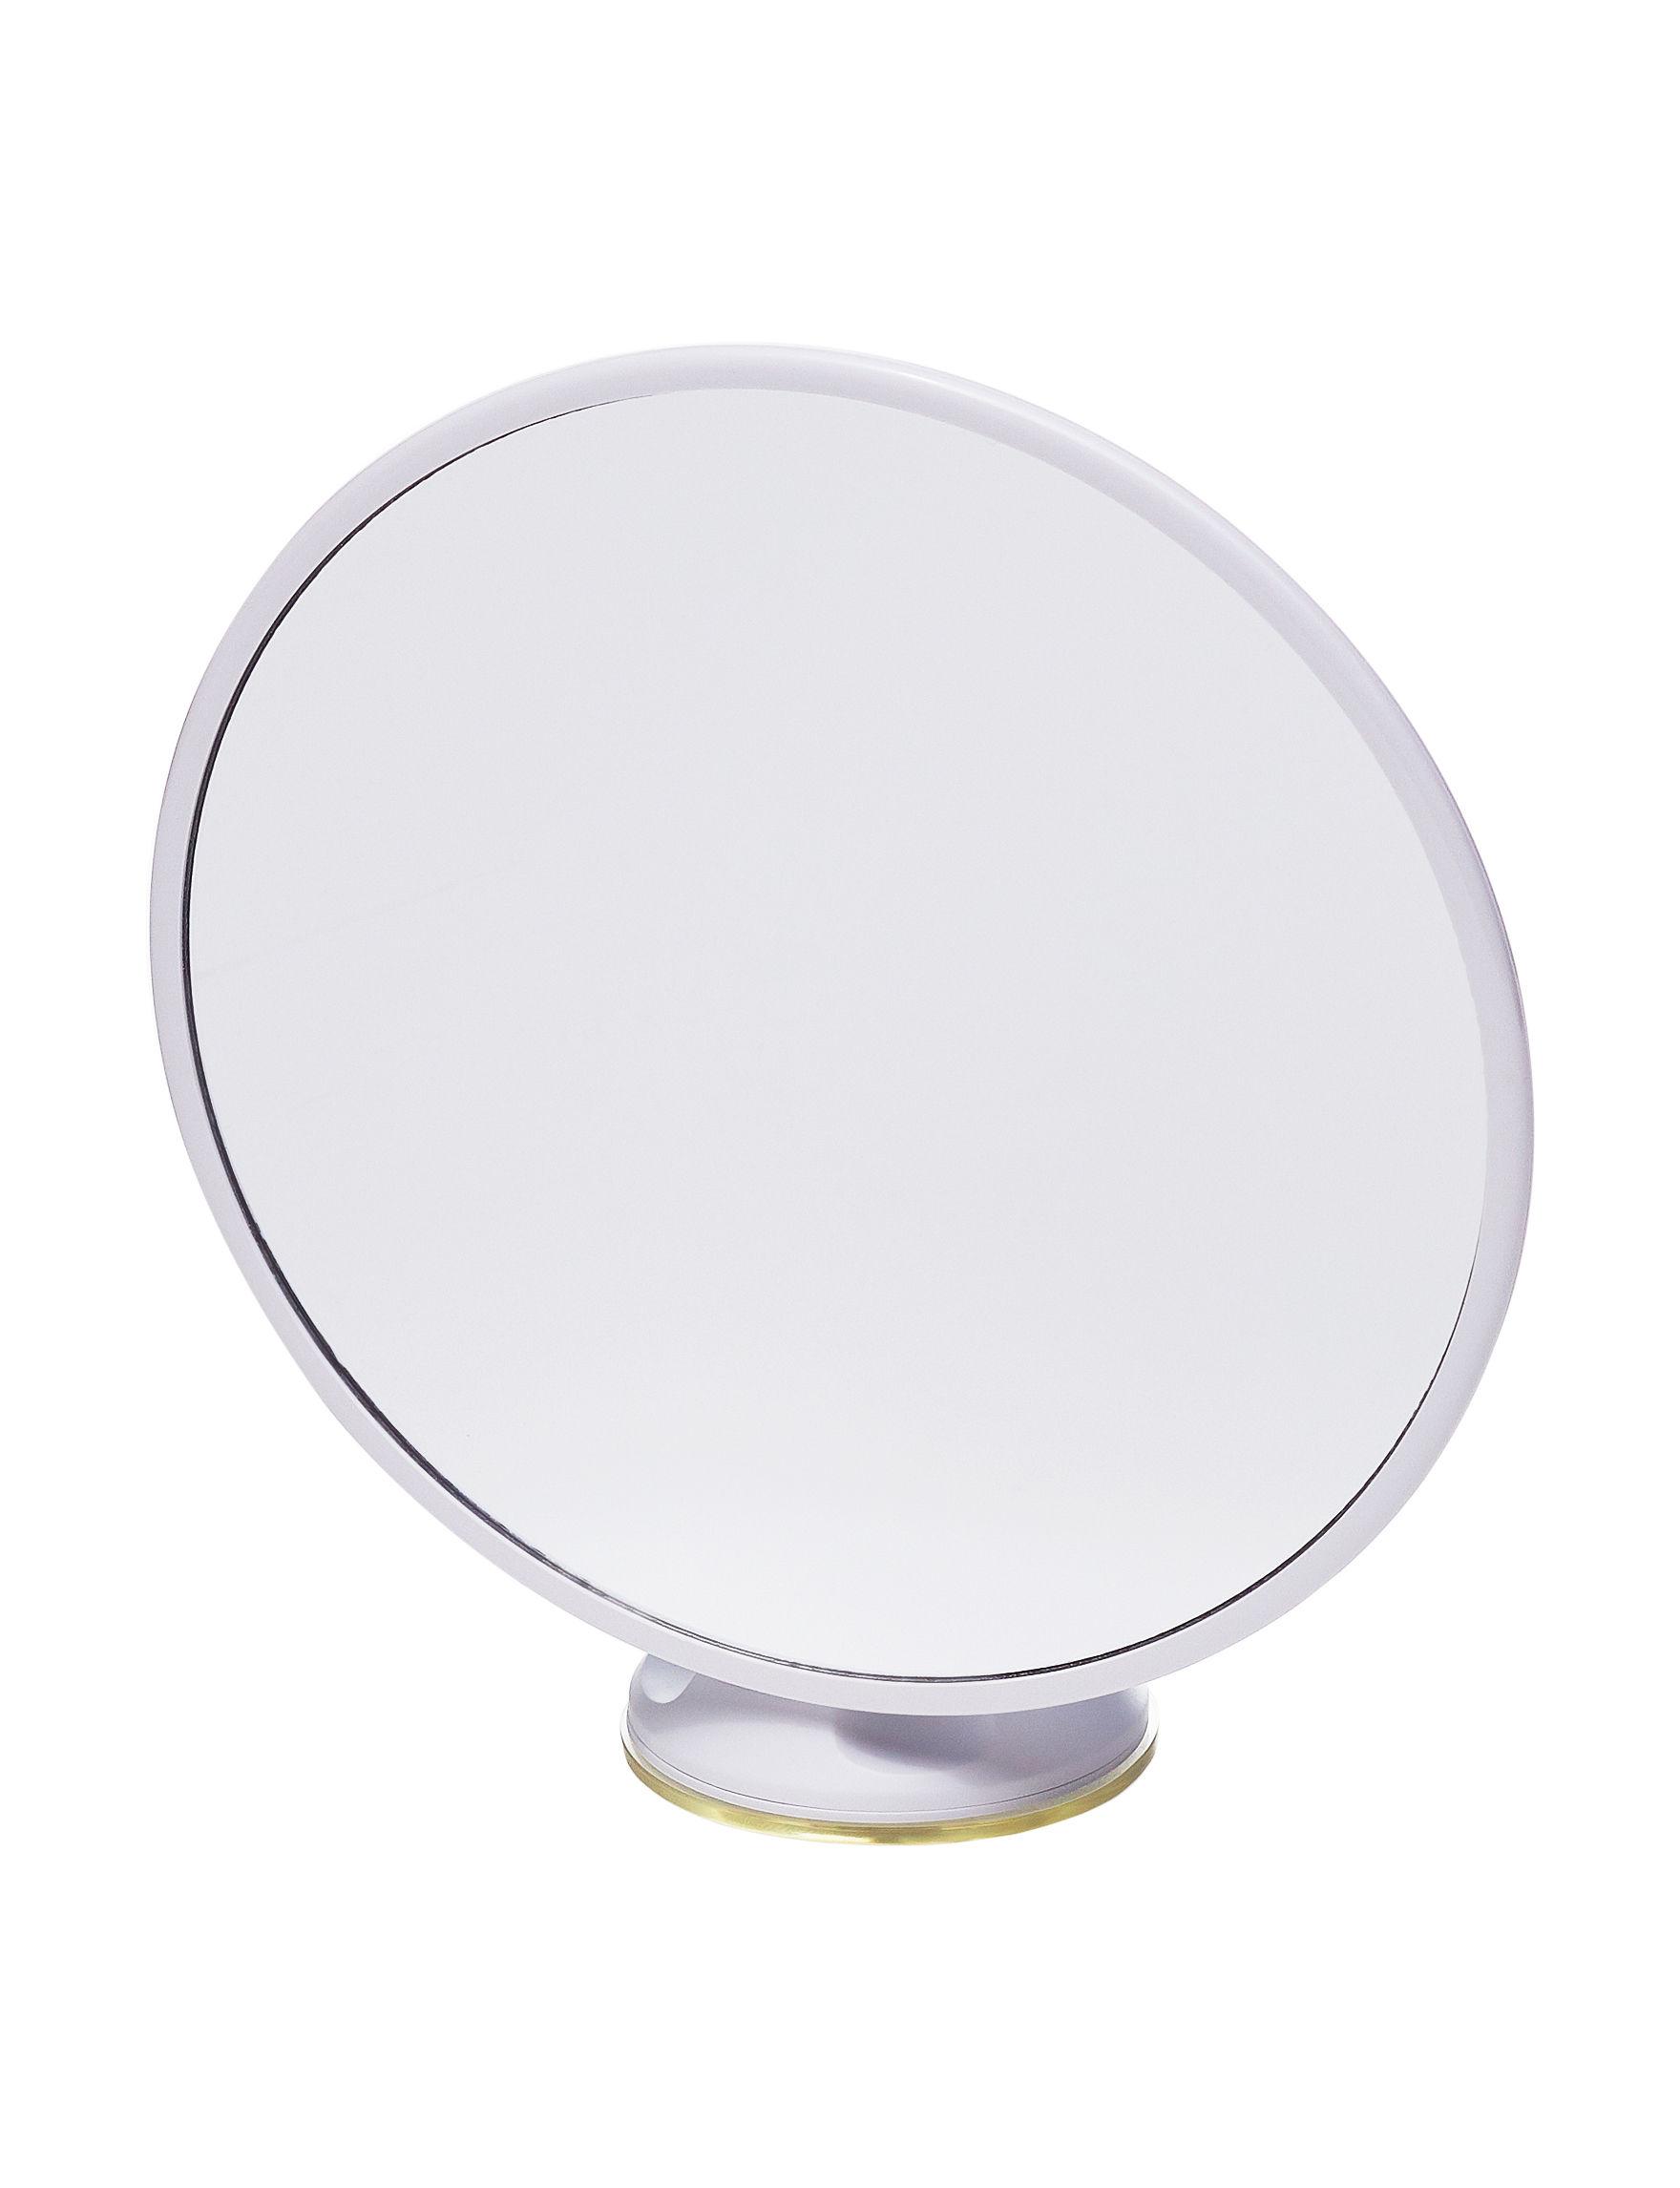 Nifty Silver Mirrors Bath Accessories